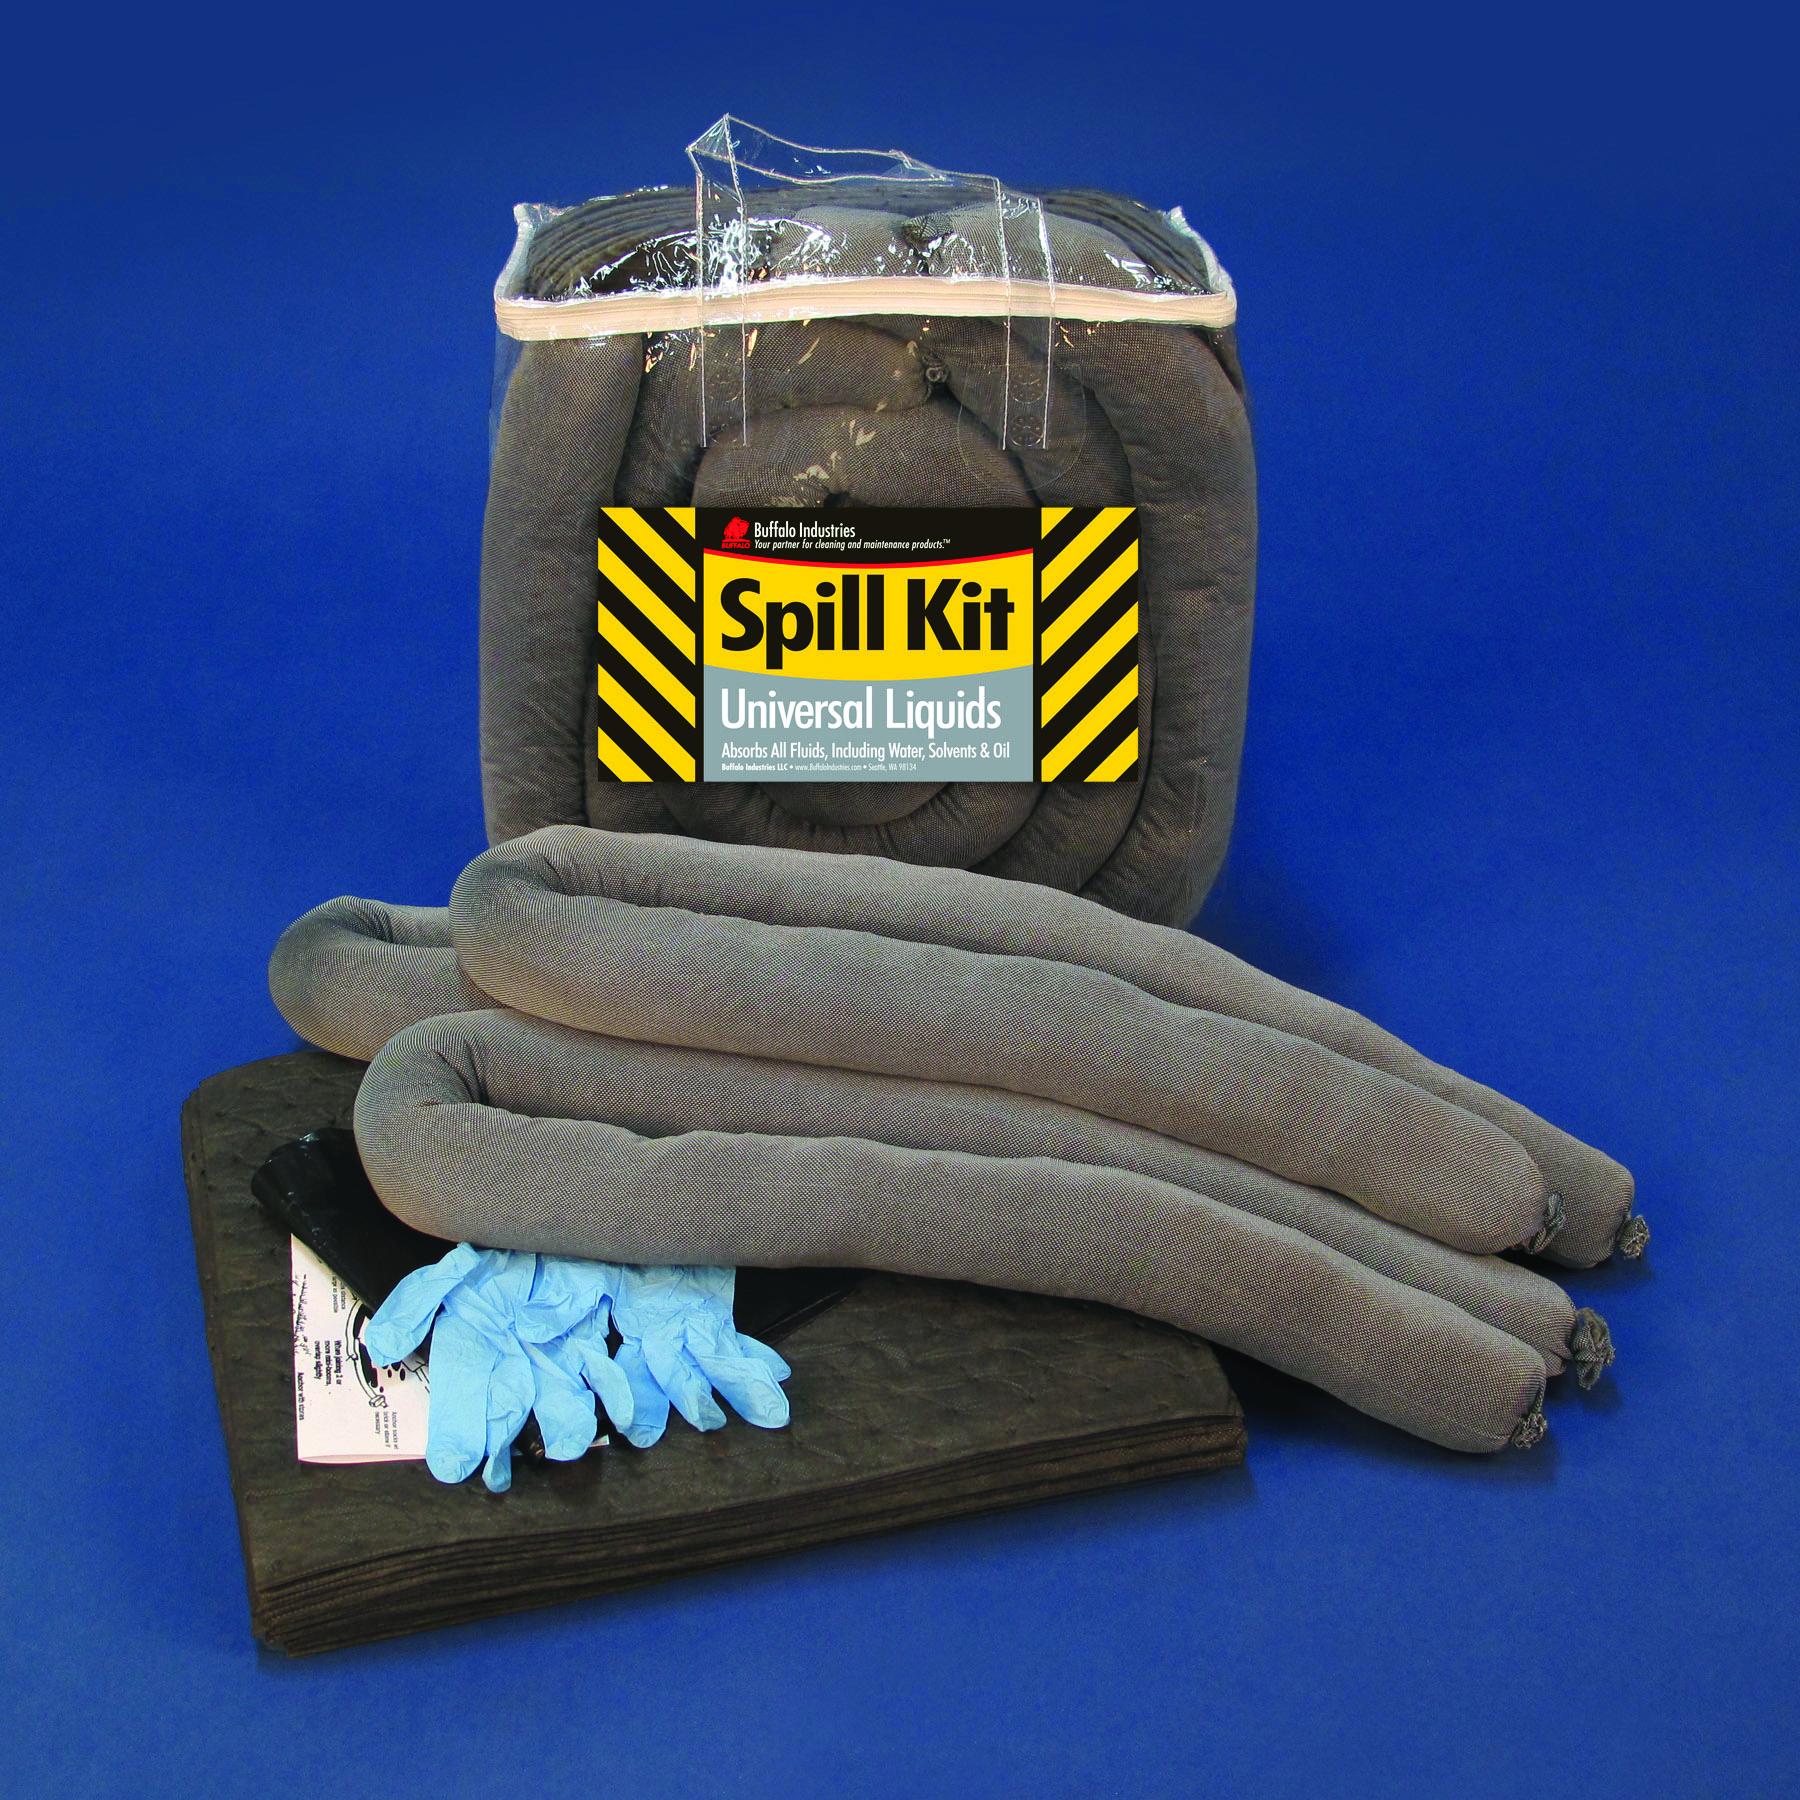 Buffalo Industries 92000 Universal Economy//Quick-Response Spill Kit, 5 Gallon